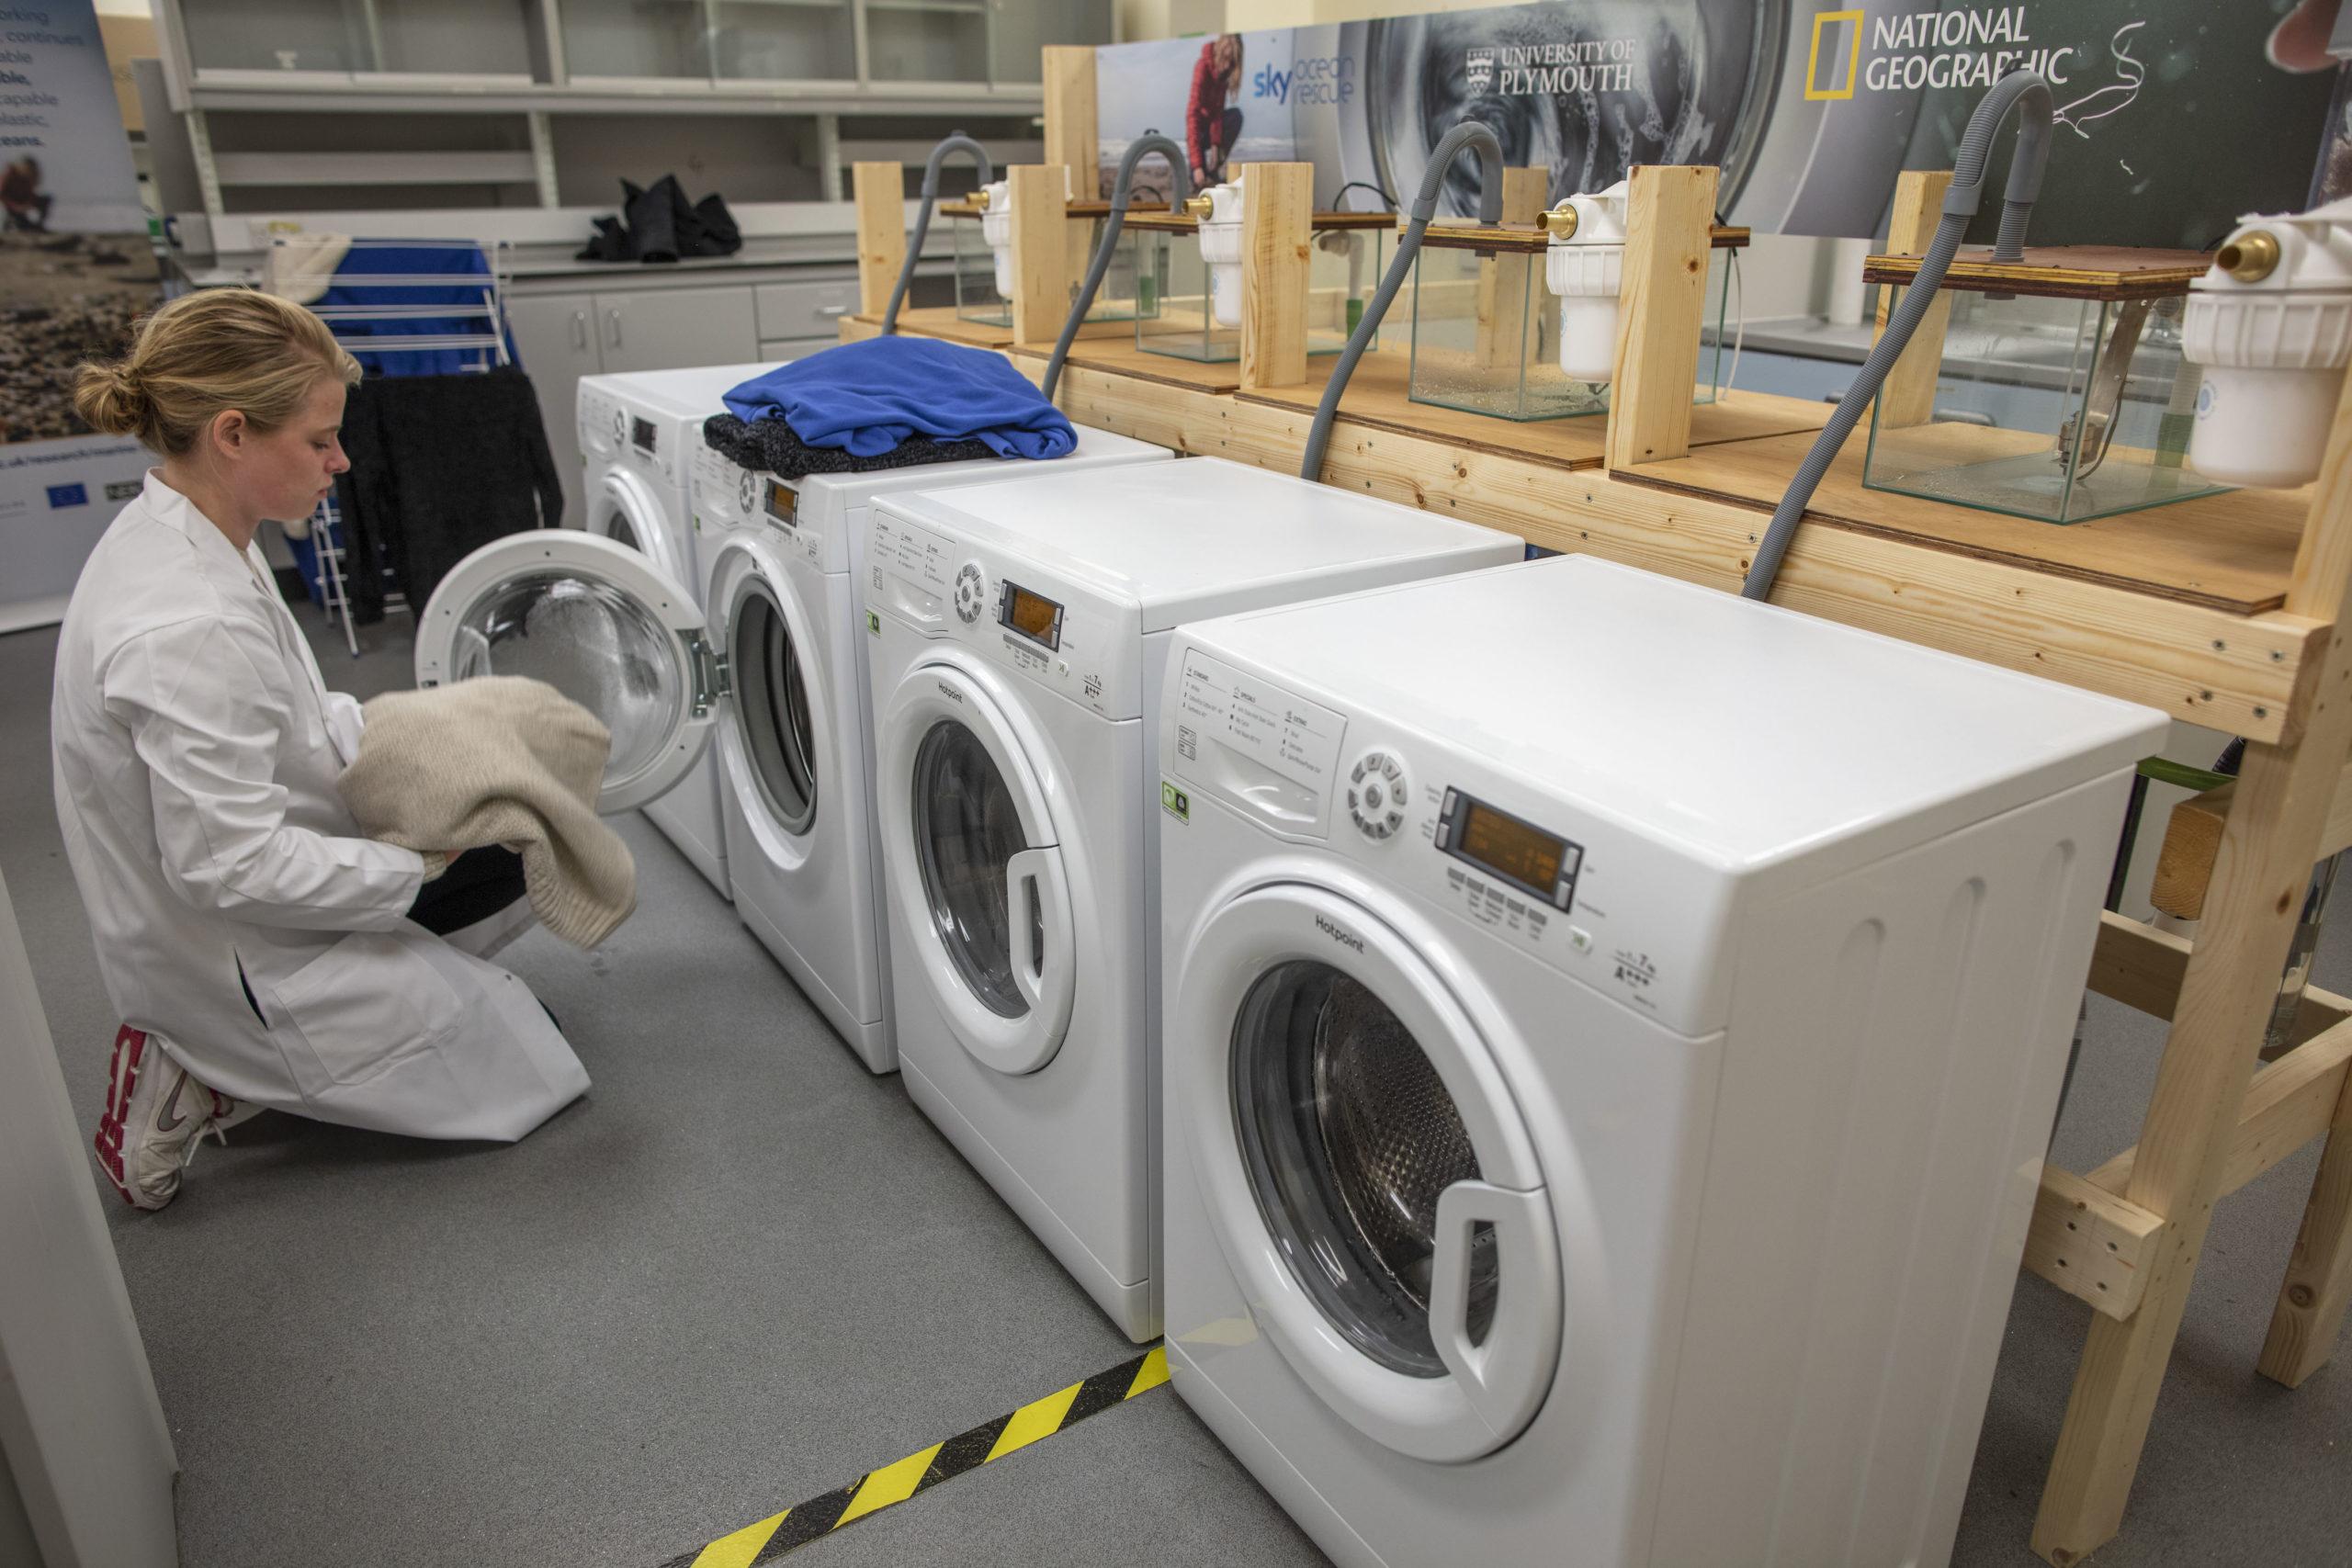 Laundry cycle fibre test